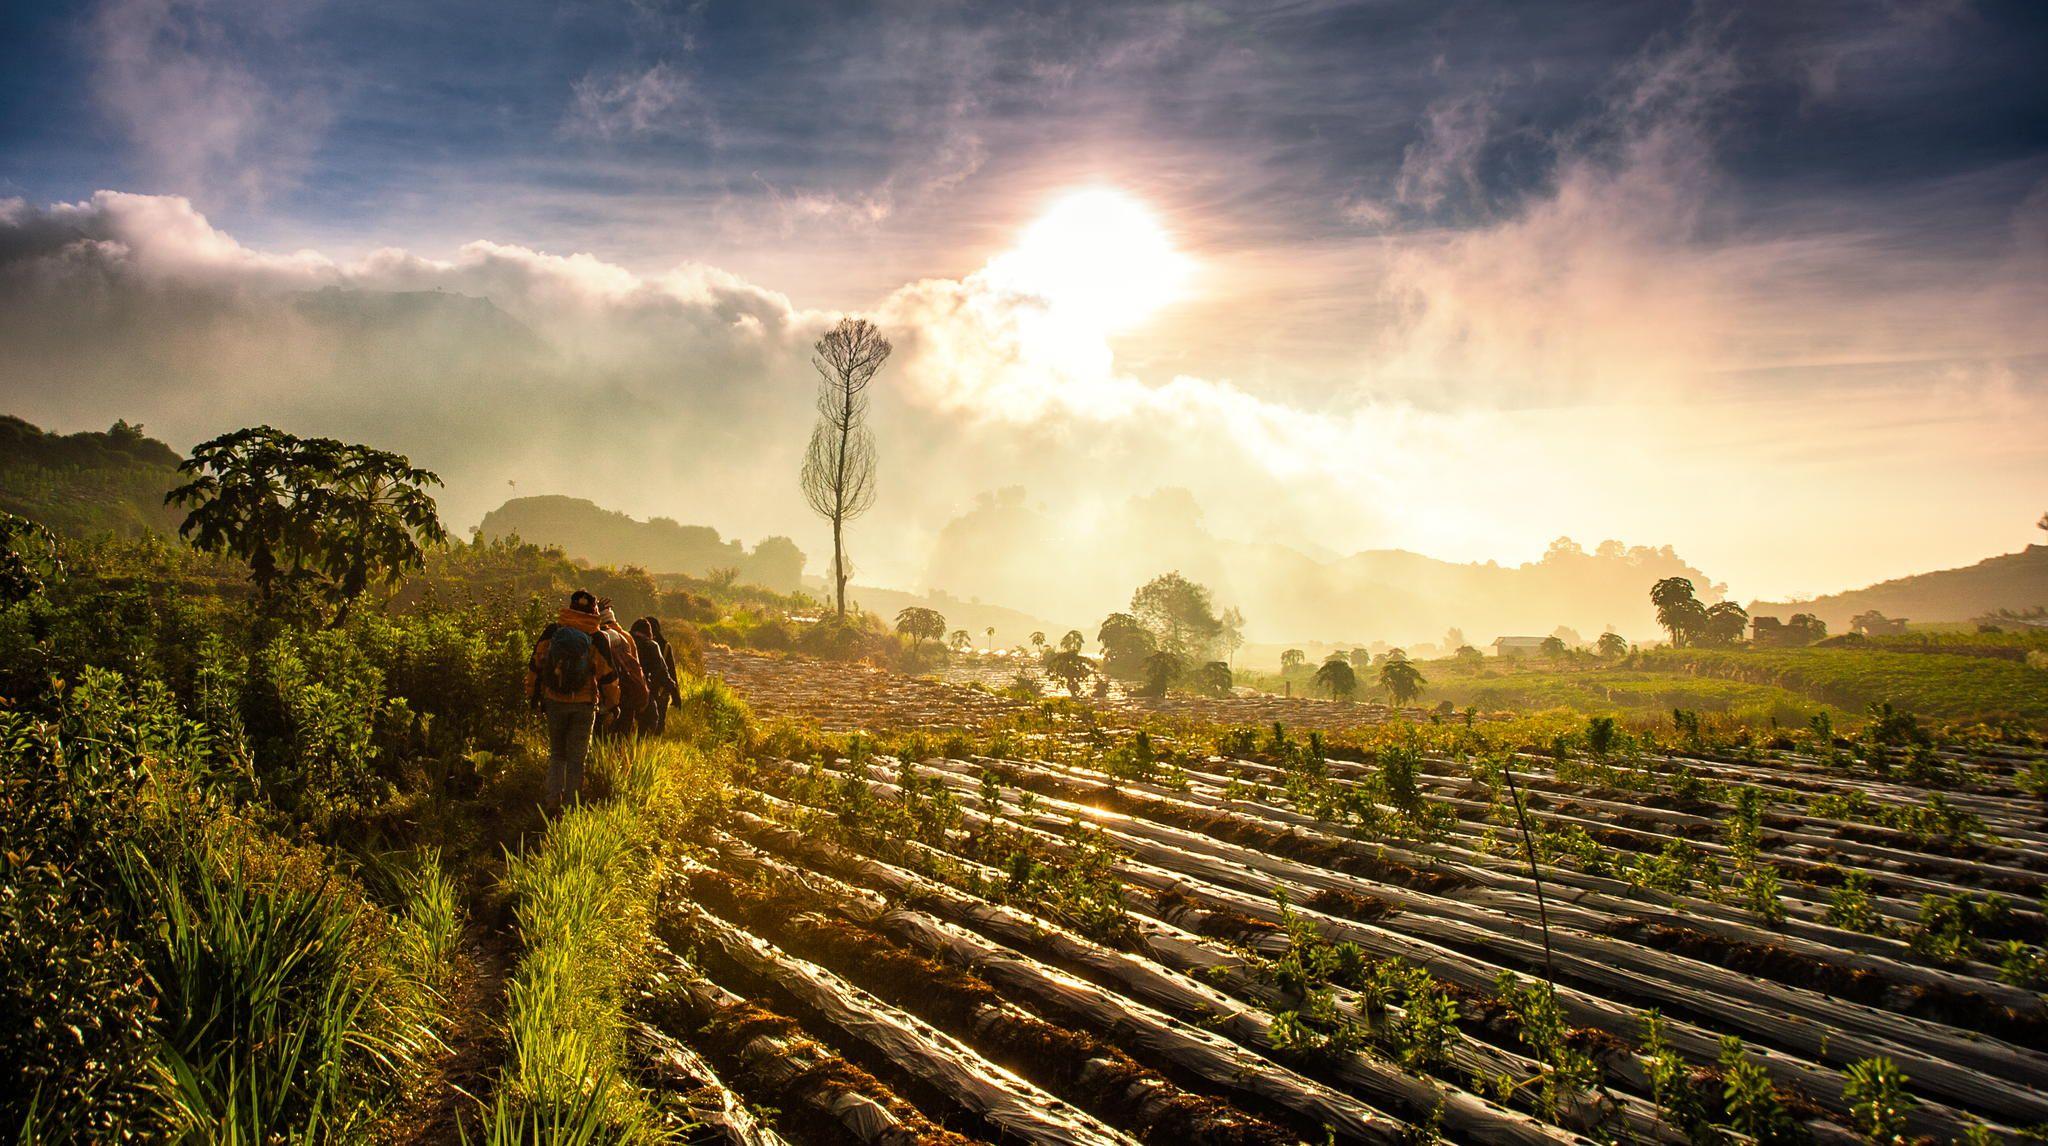 Crossing Potato Field by Ahmad Syukaery on 500px Indonesia